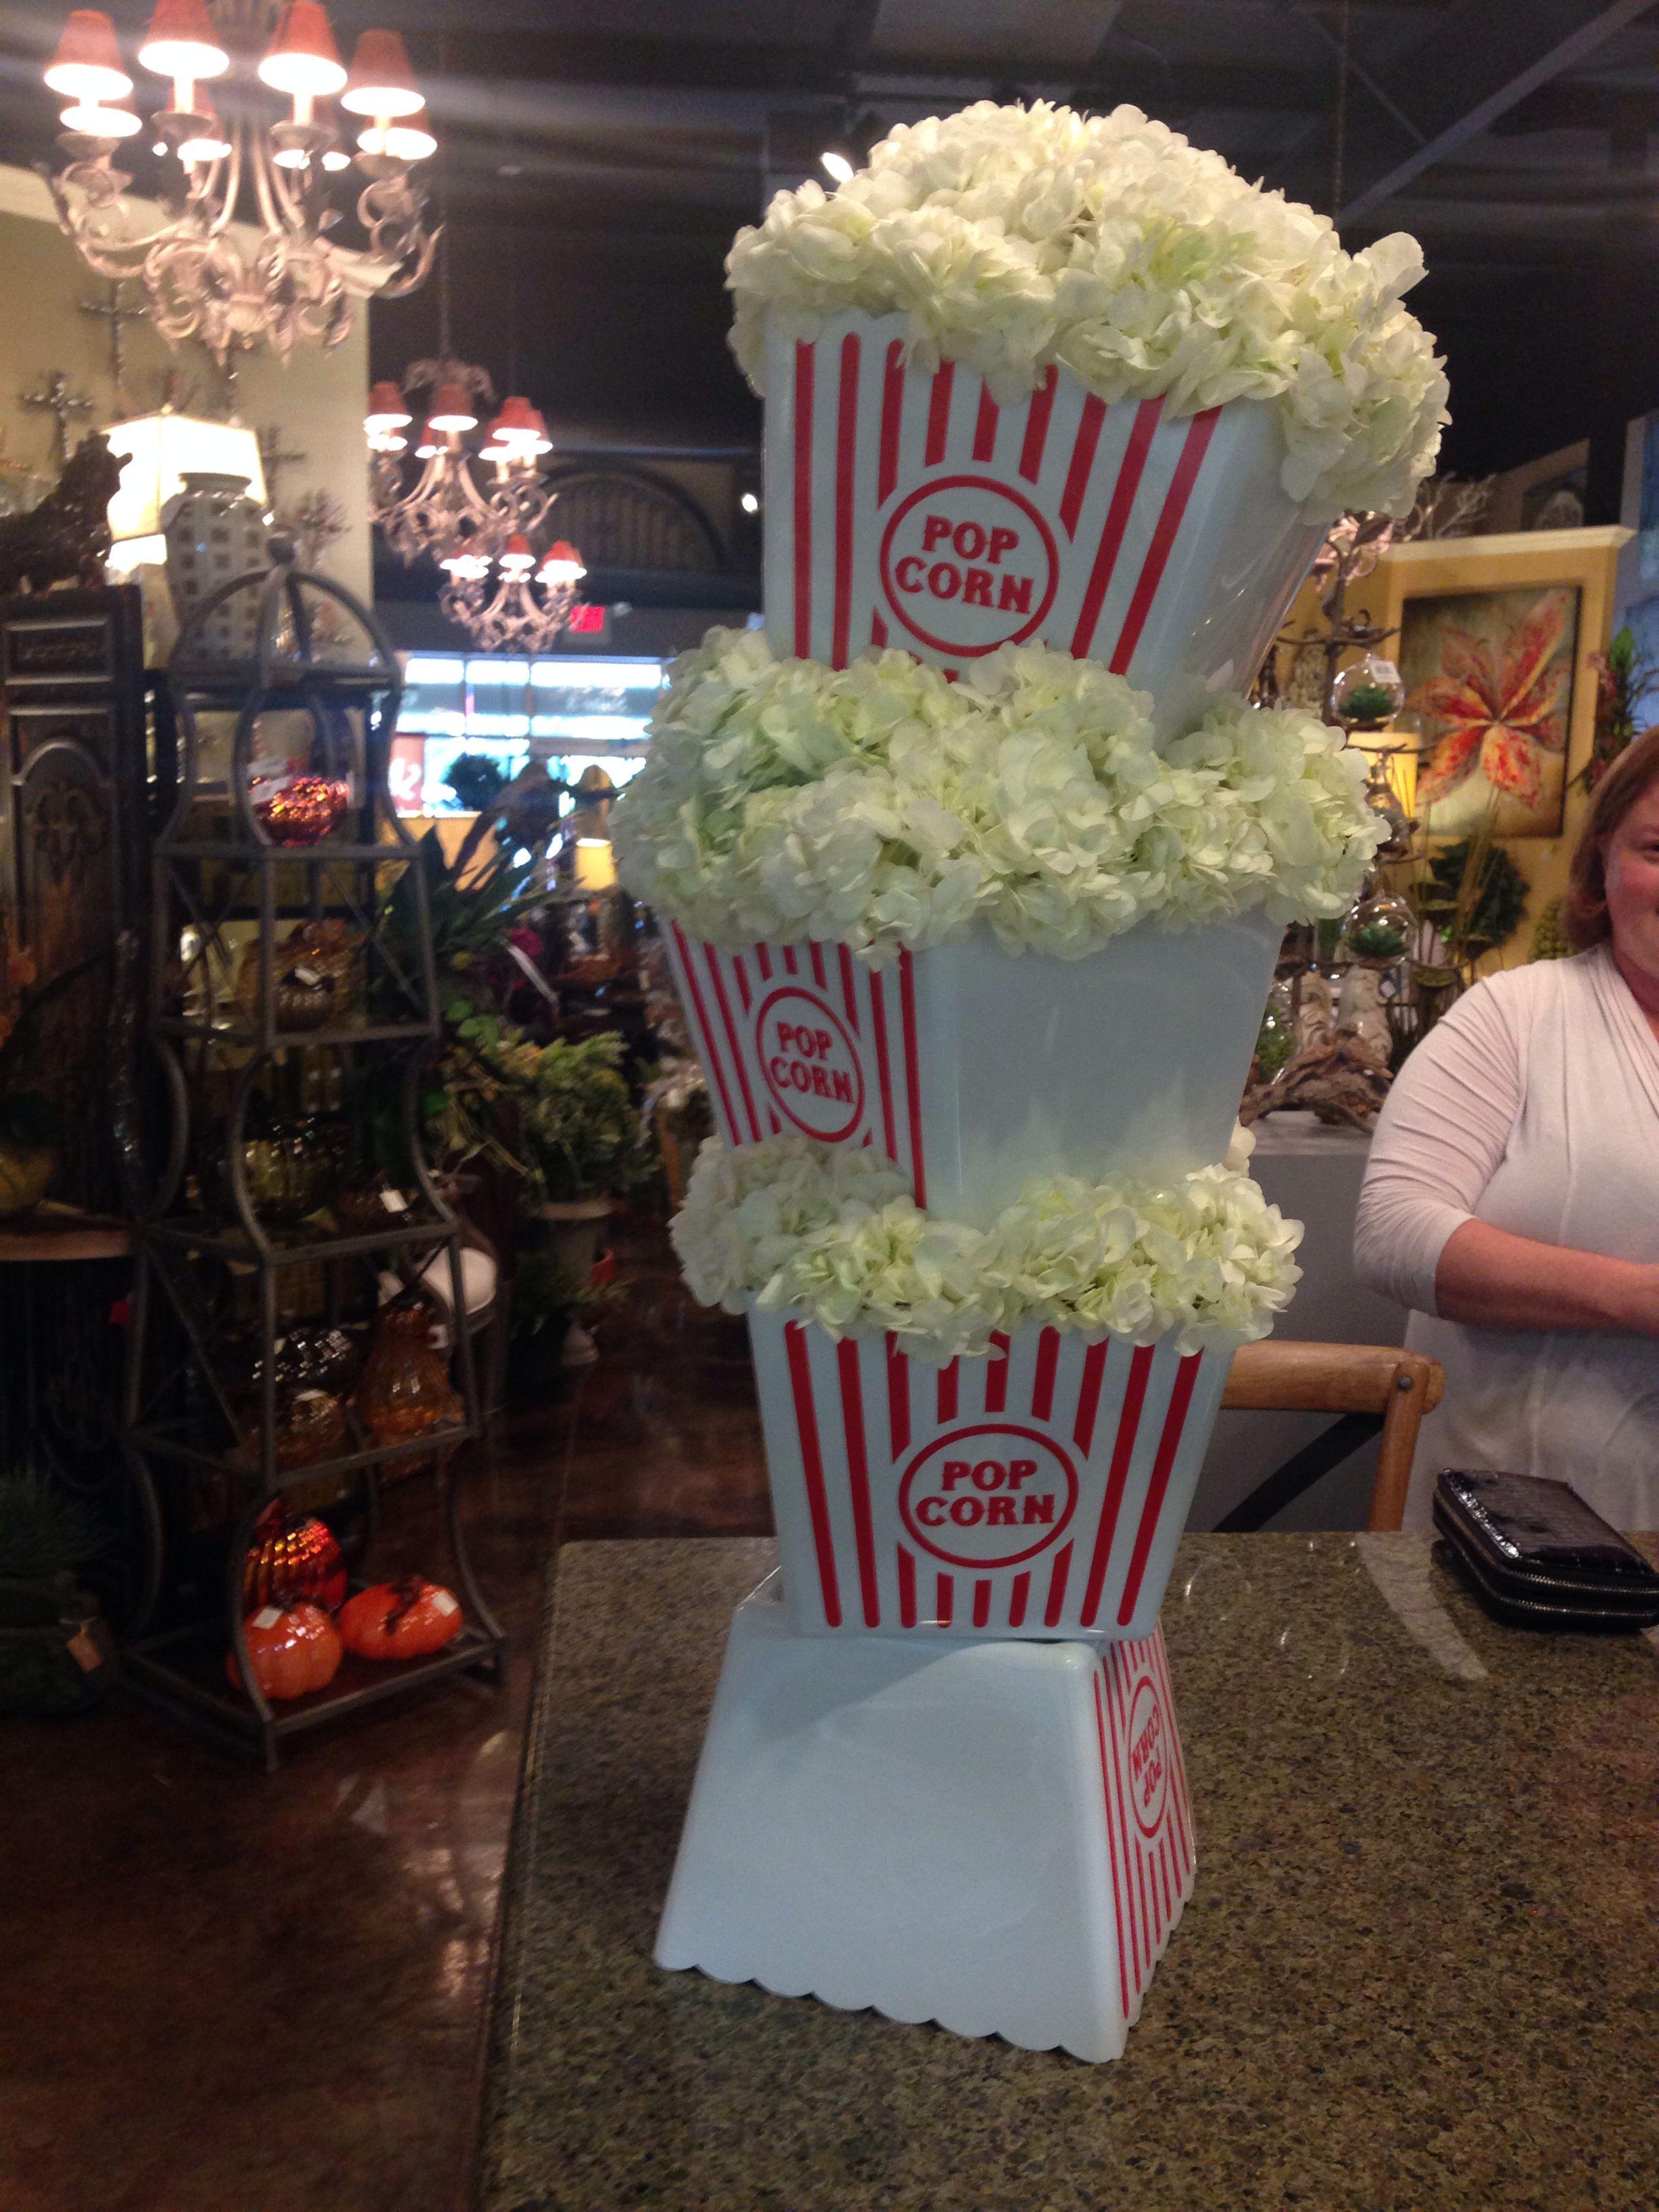 Popcorn Buckets Filled With Hydrangeas To Look Like